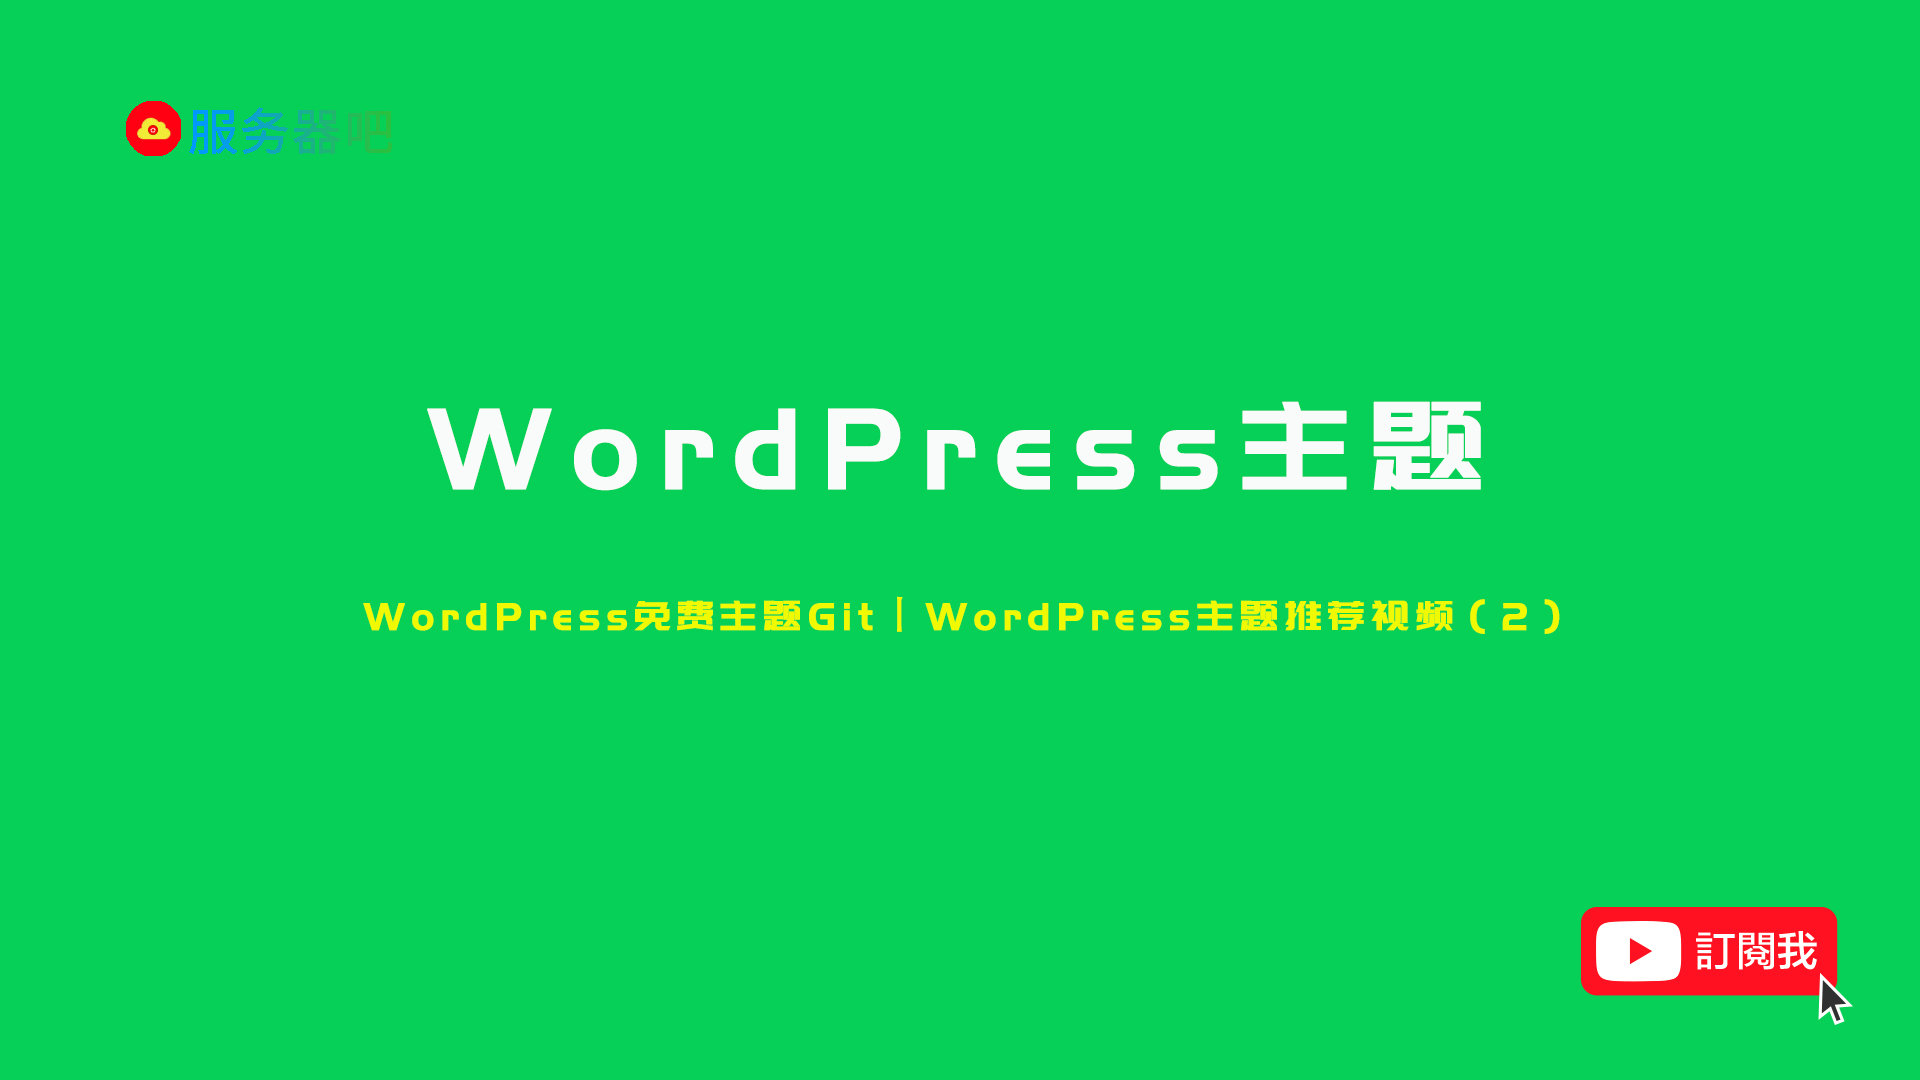 WordPress主题:来自极客公园的WordPress免费主题,Git主题